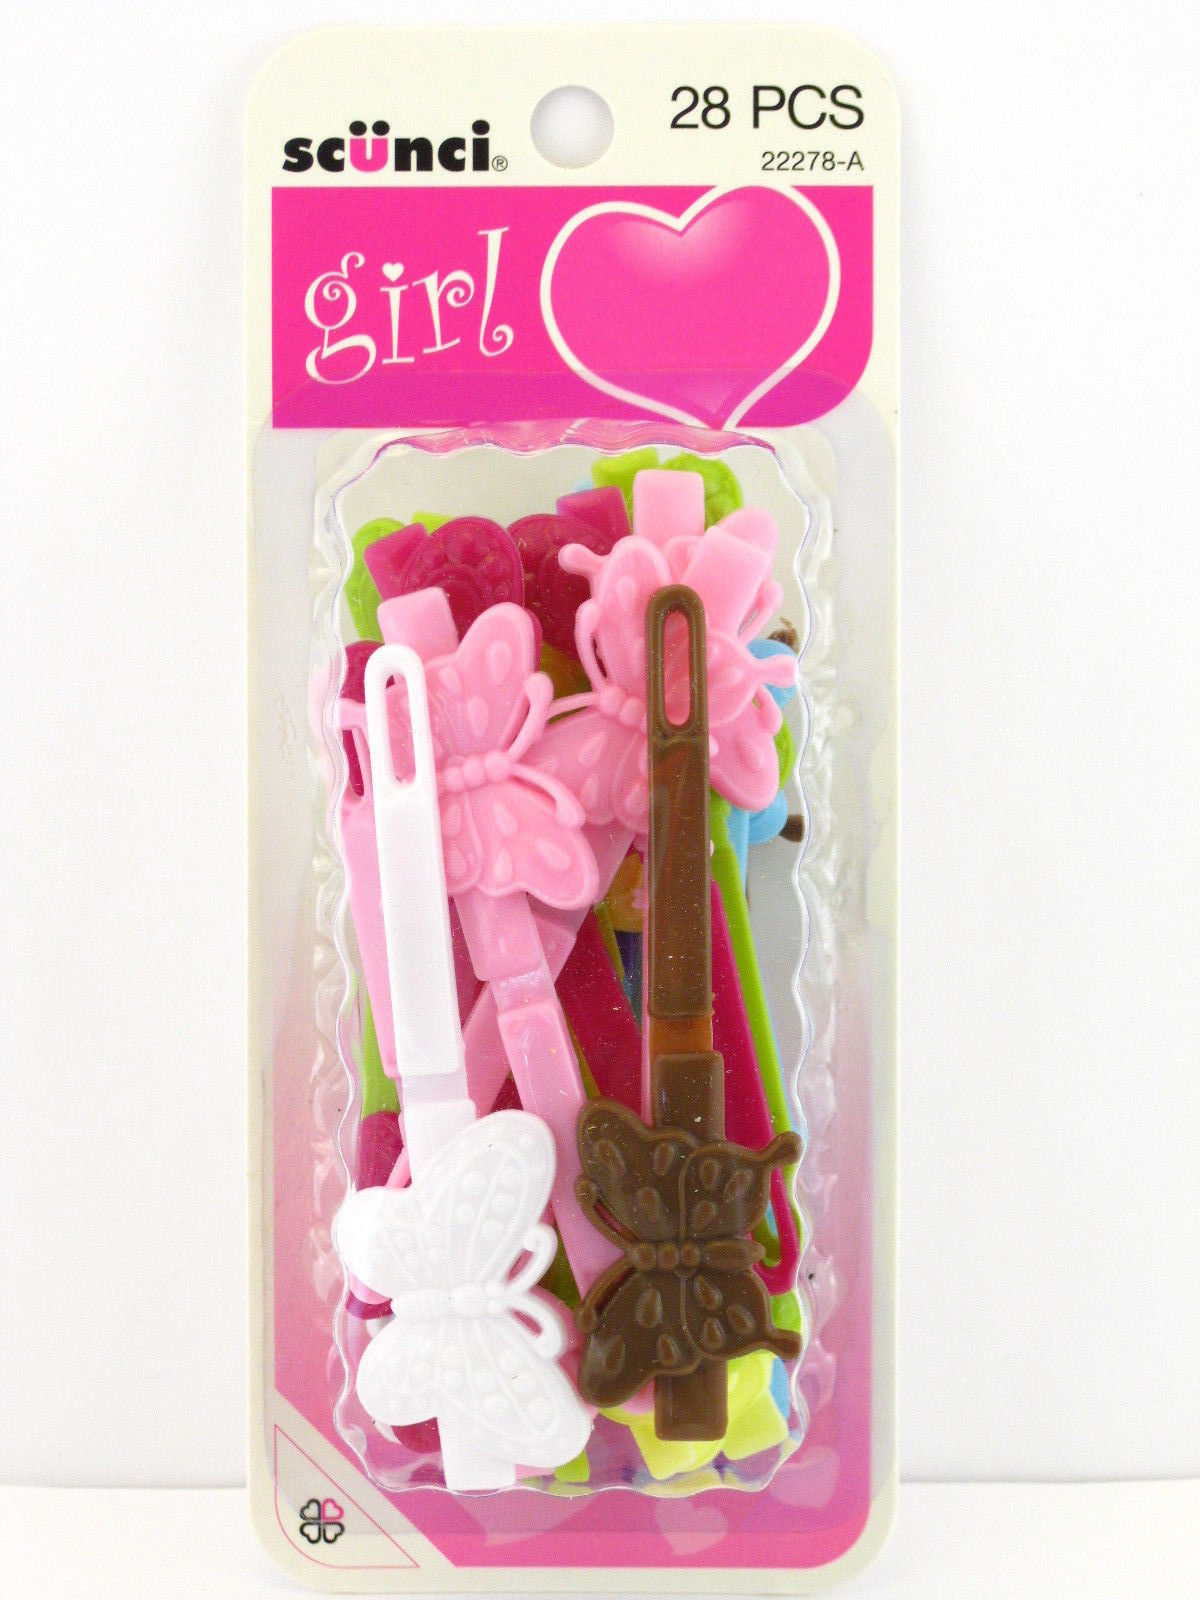 20 PCS. 08973 TARA GIRLS SELF HINGE PLASTIC BOW HAIR BARRETTES